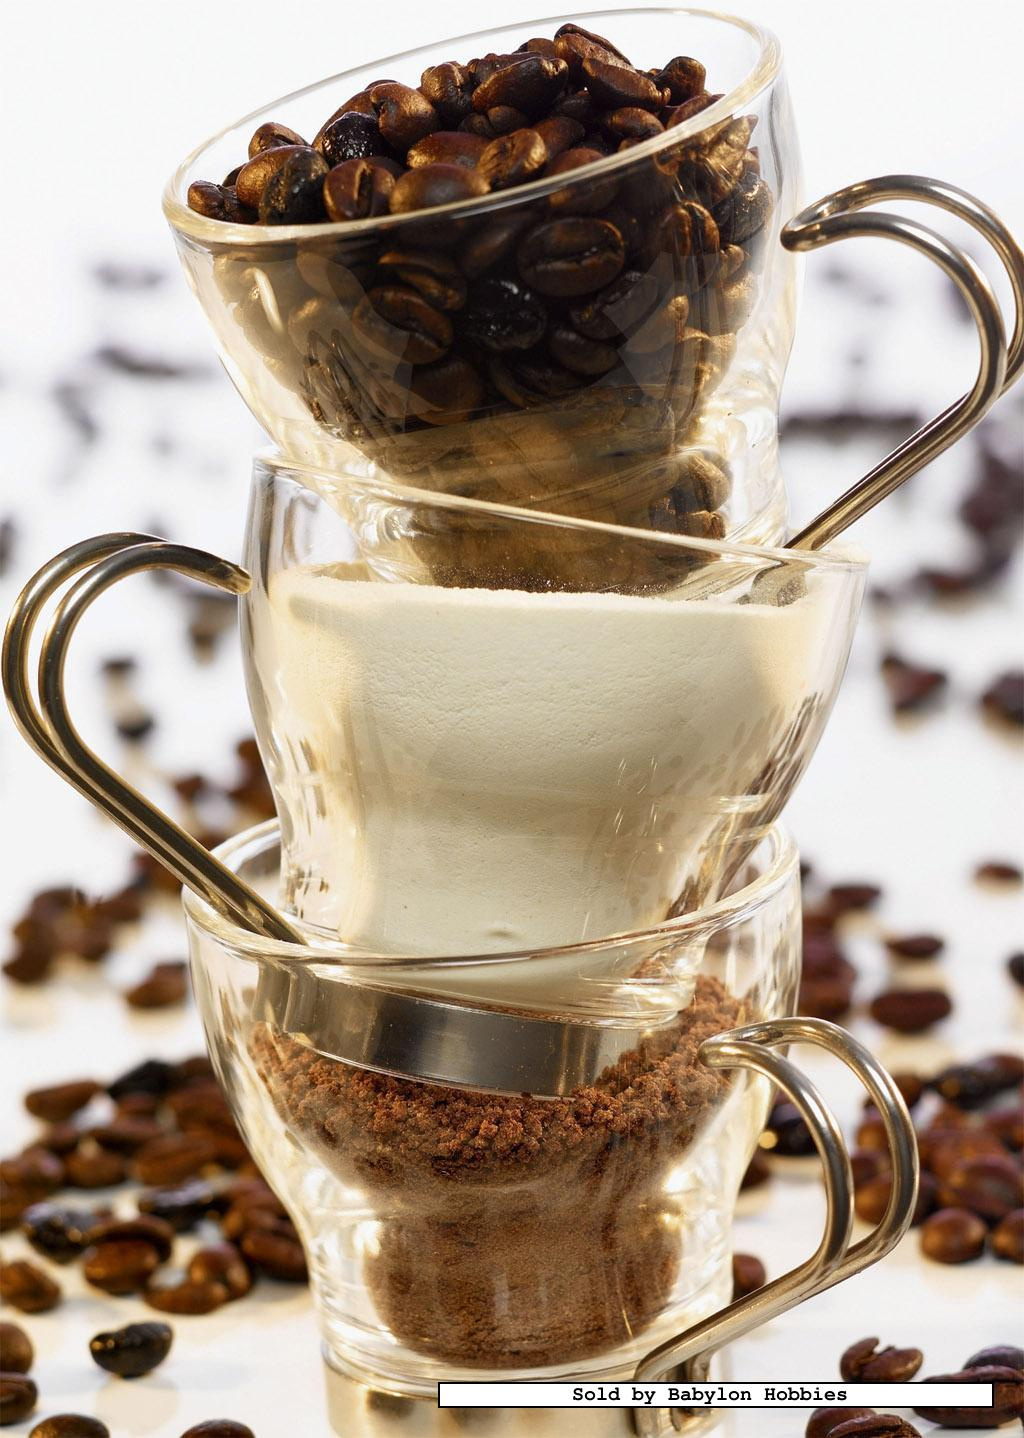 1000 pcs jigsaw puzzle: Wood Finish - Coffee Milk and sugar (Food) 4005556190034 | eBay